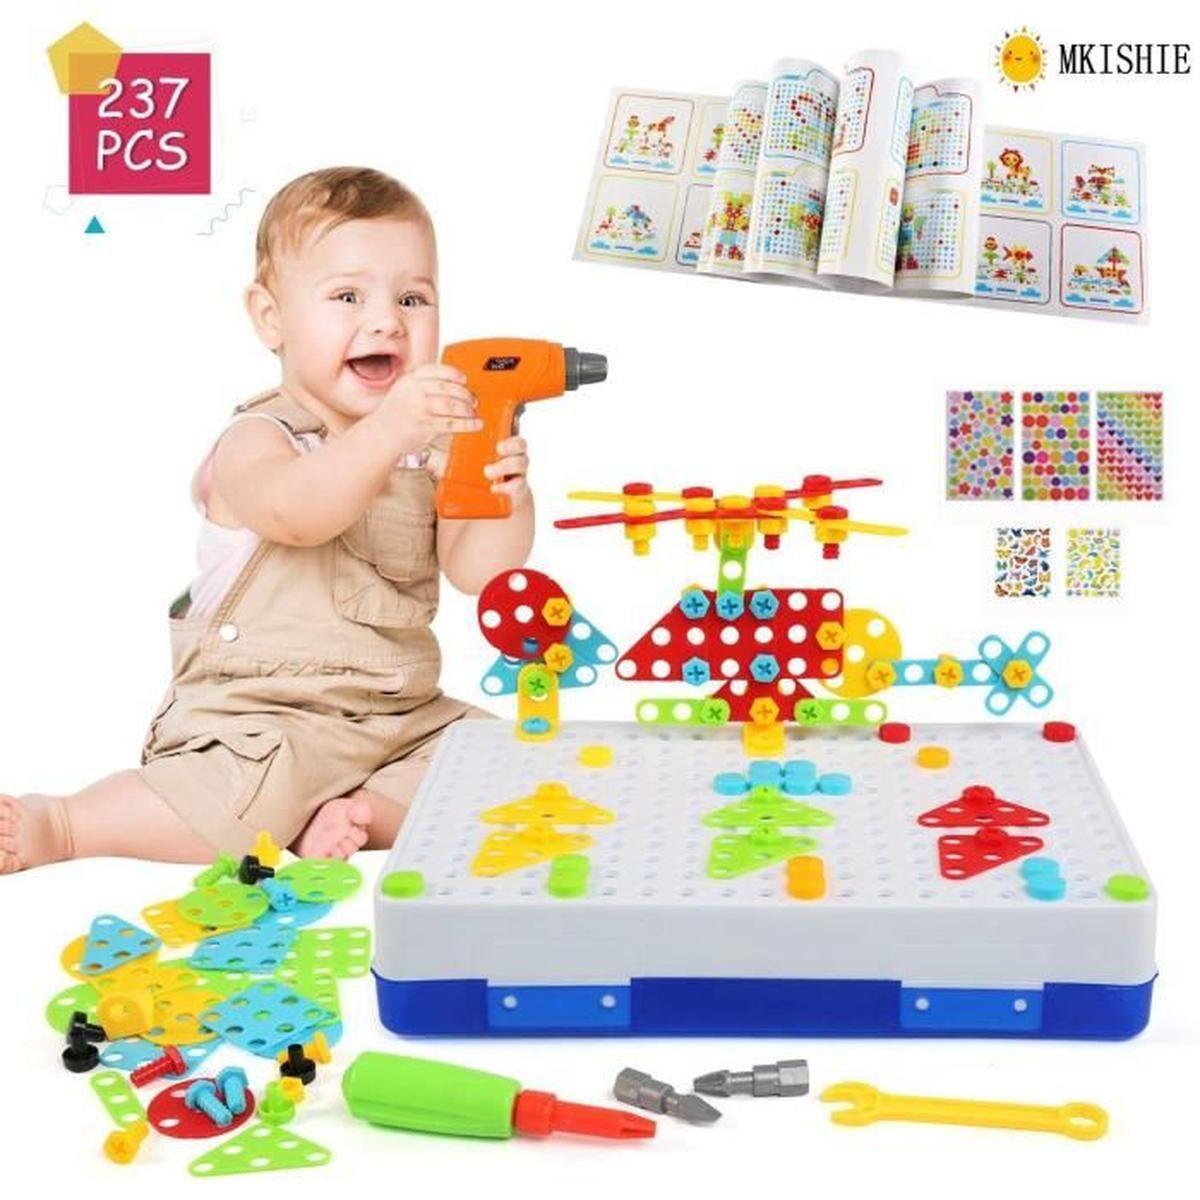 Jeu Educatif Montessori Pour 3 Ans serapportantà Jeu Educatif 3 Ans